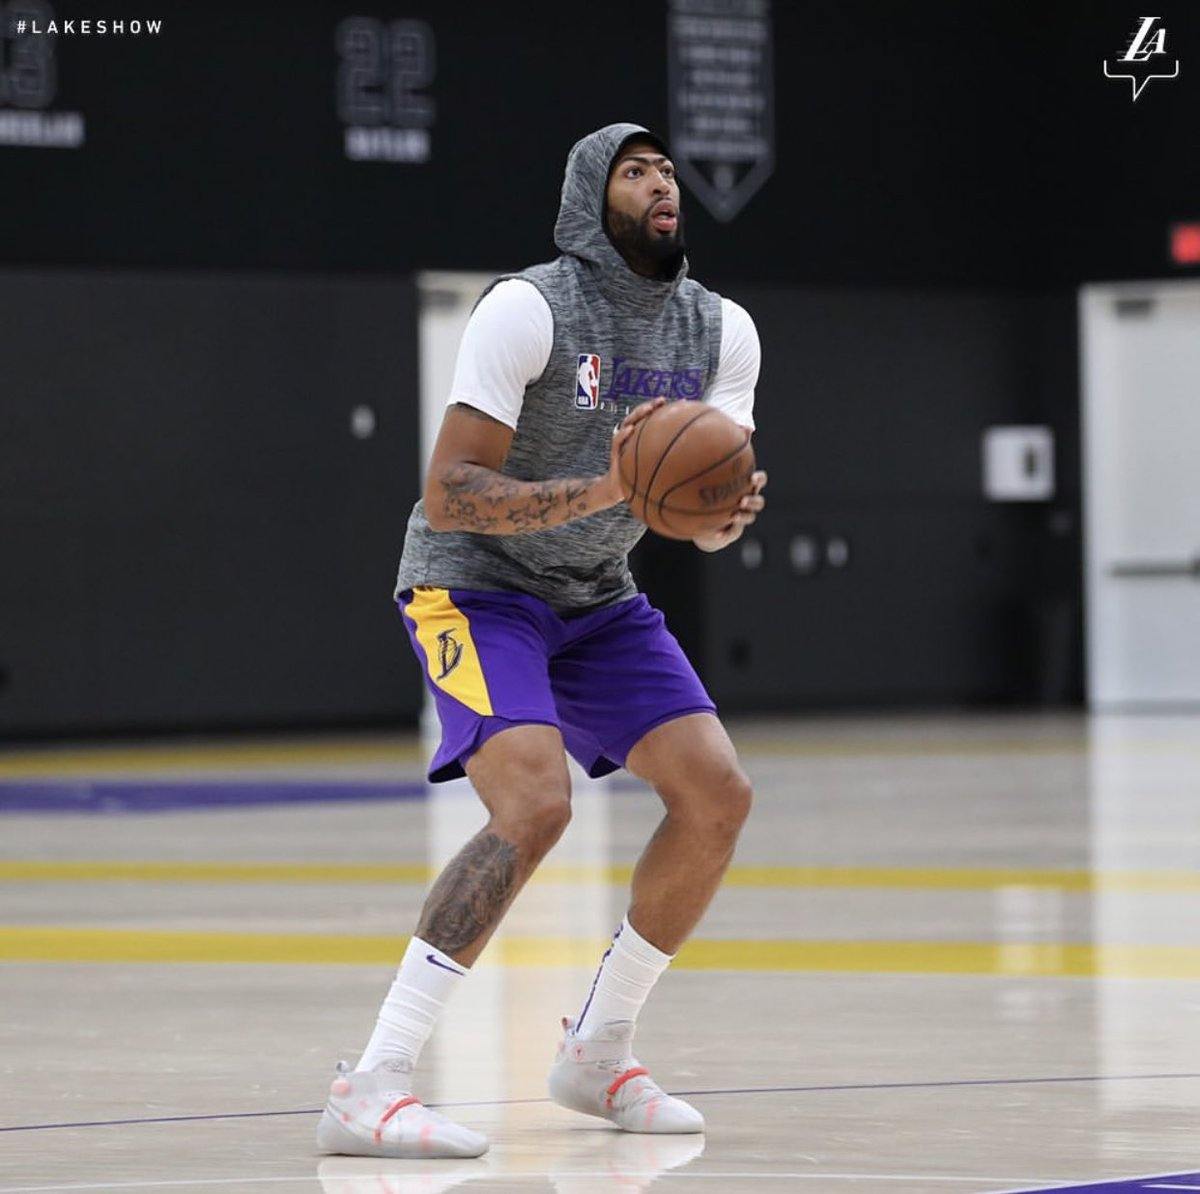 AntDavis23 wearing the Nike Kobe AD NXT